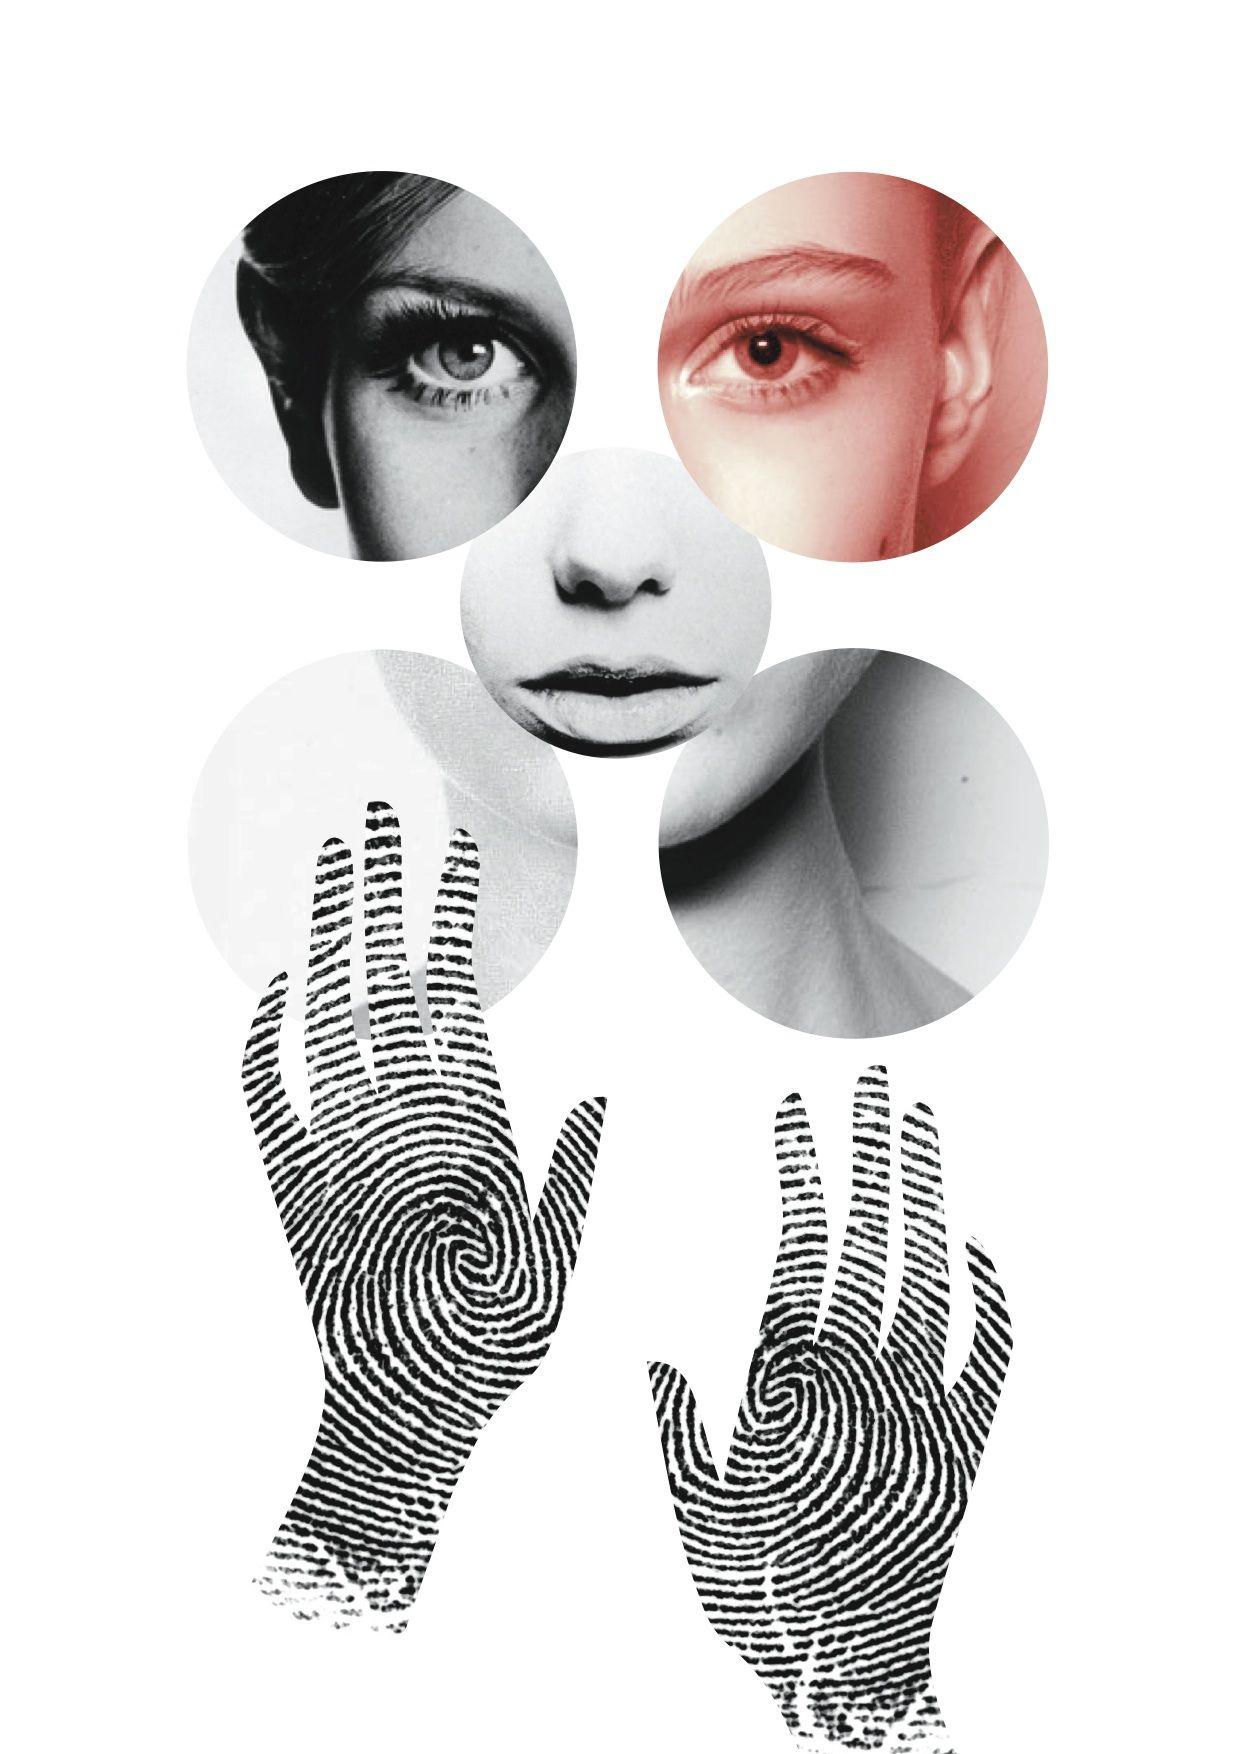 By essingtonbee designs. #graphic #design #circles #hands